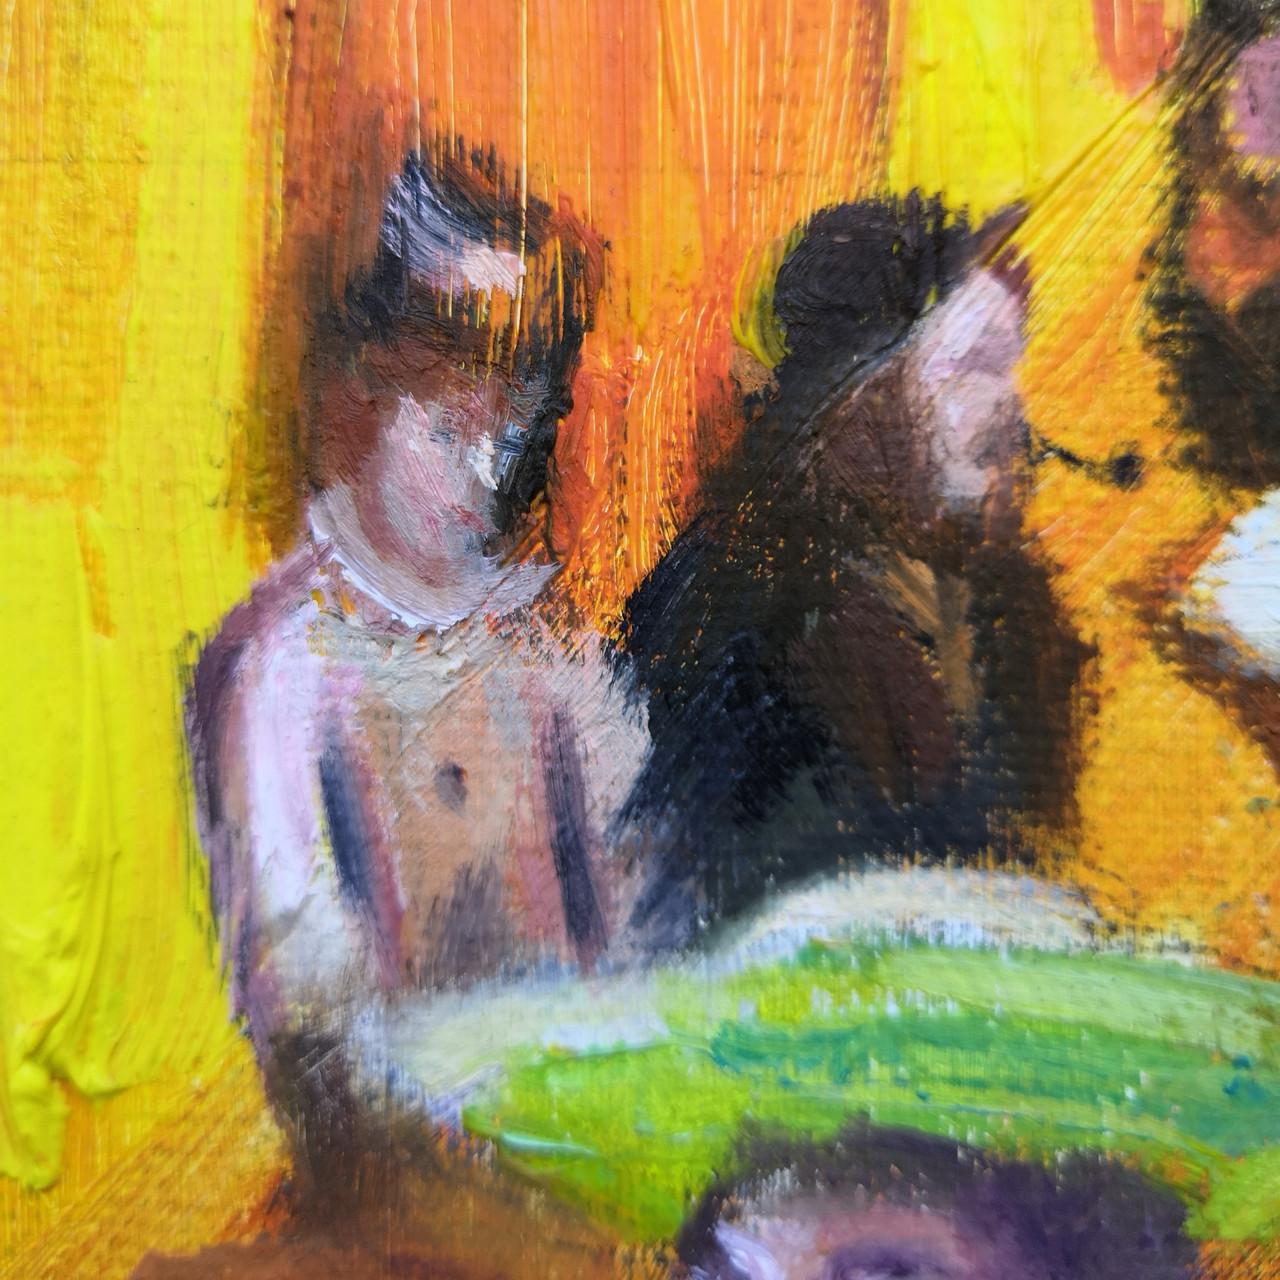 Absinthe Drinkers_Degas_Nick Pike Art